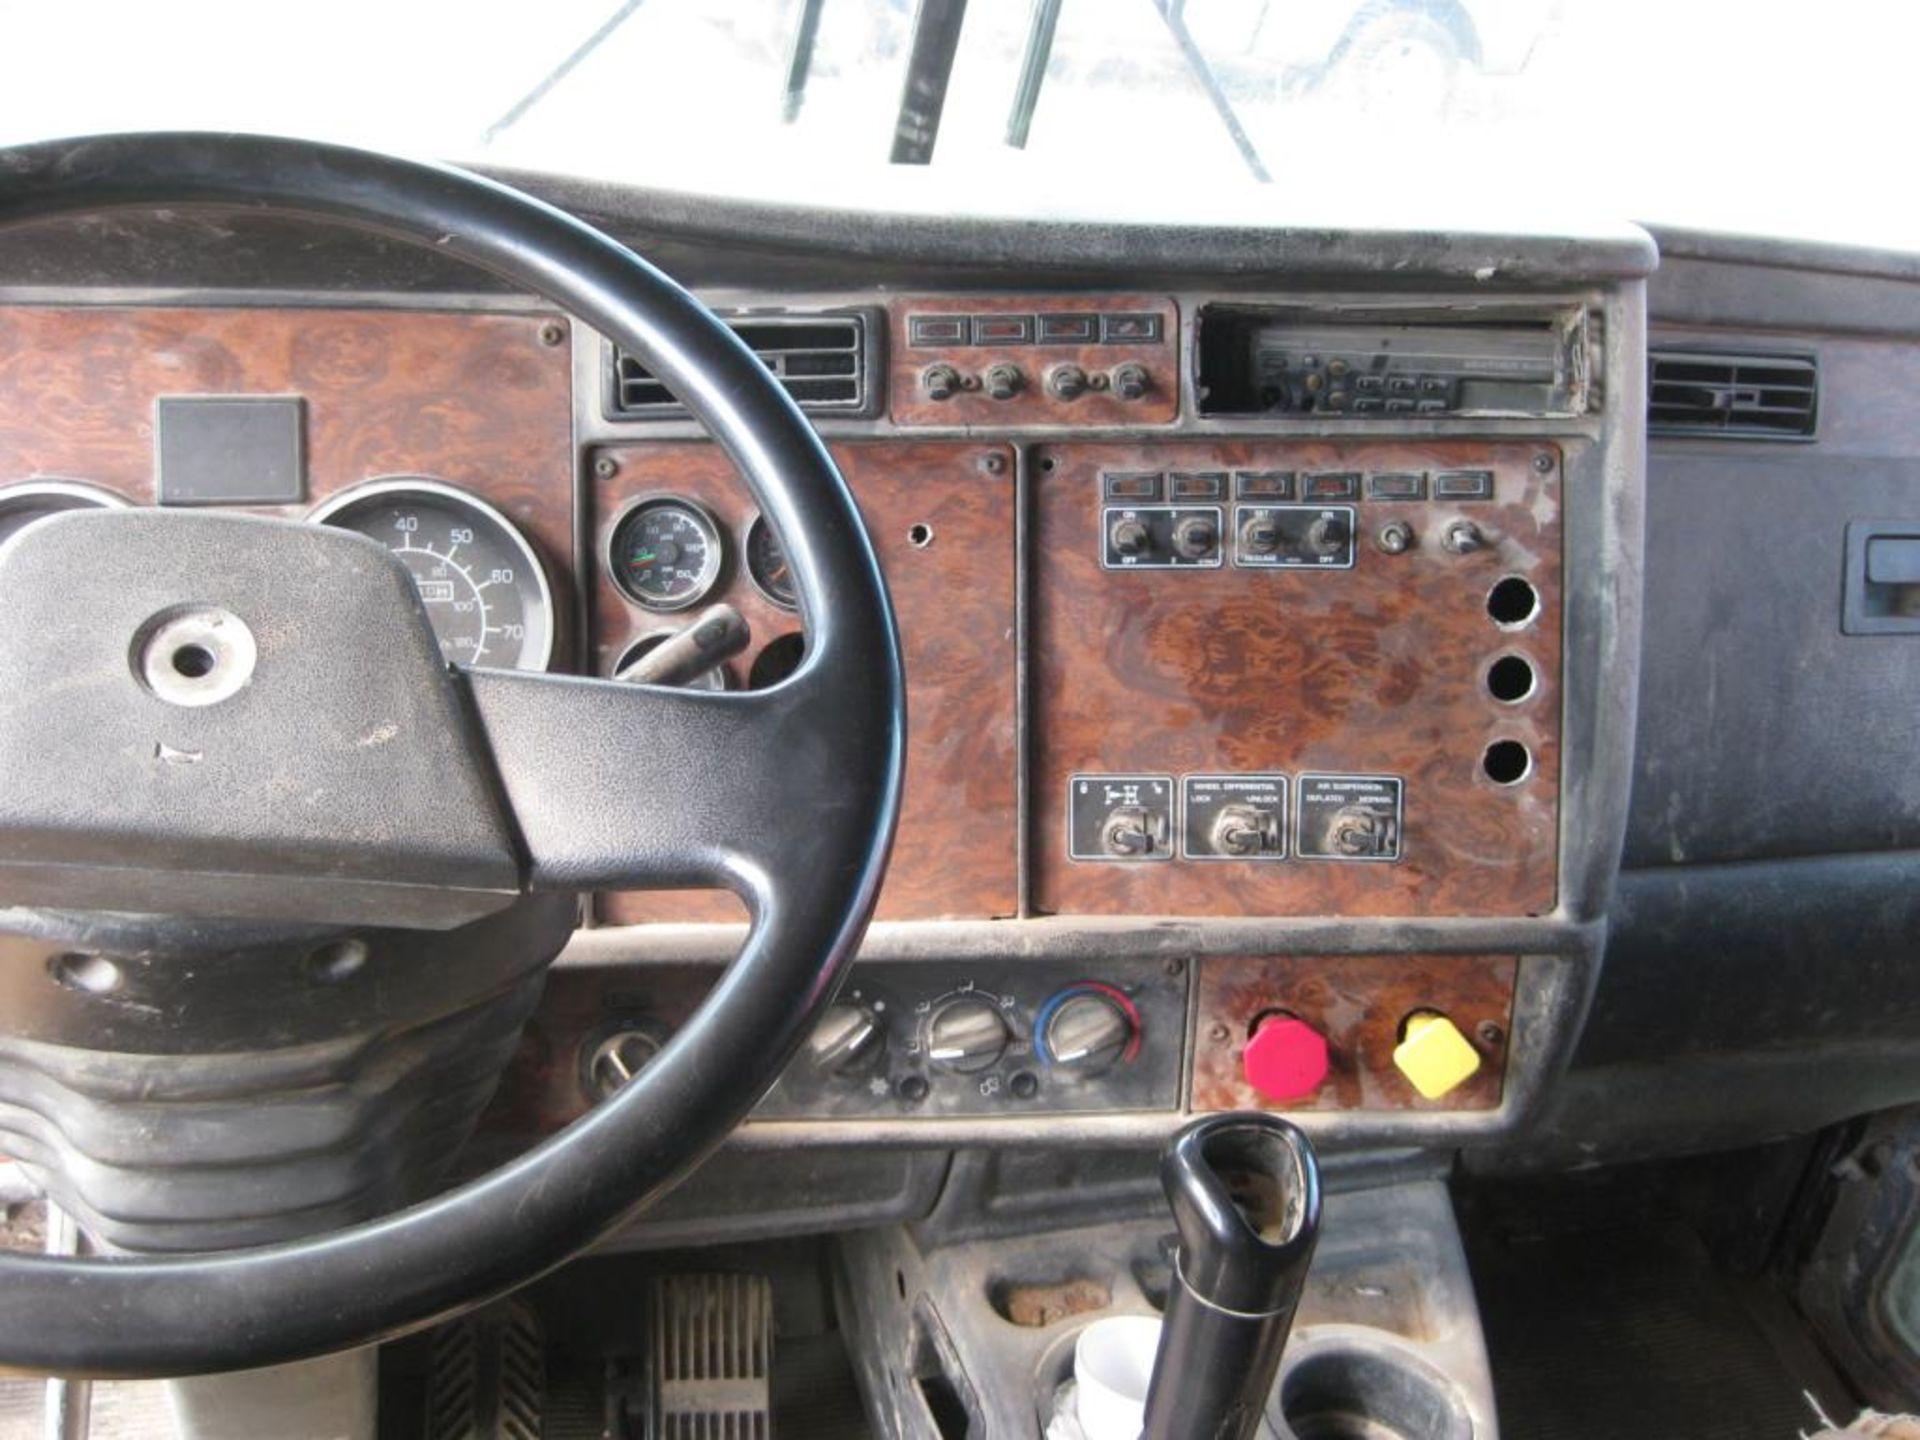 Kenworth Truck - Image 12 of 21